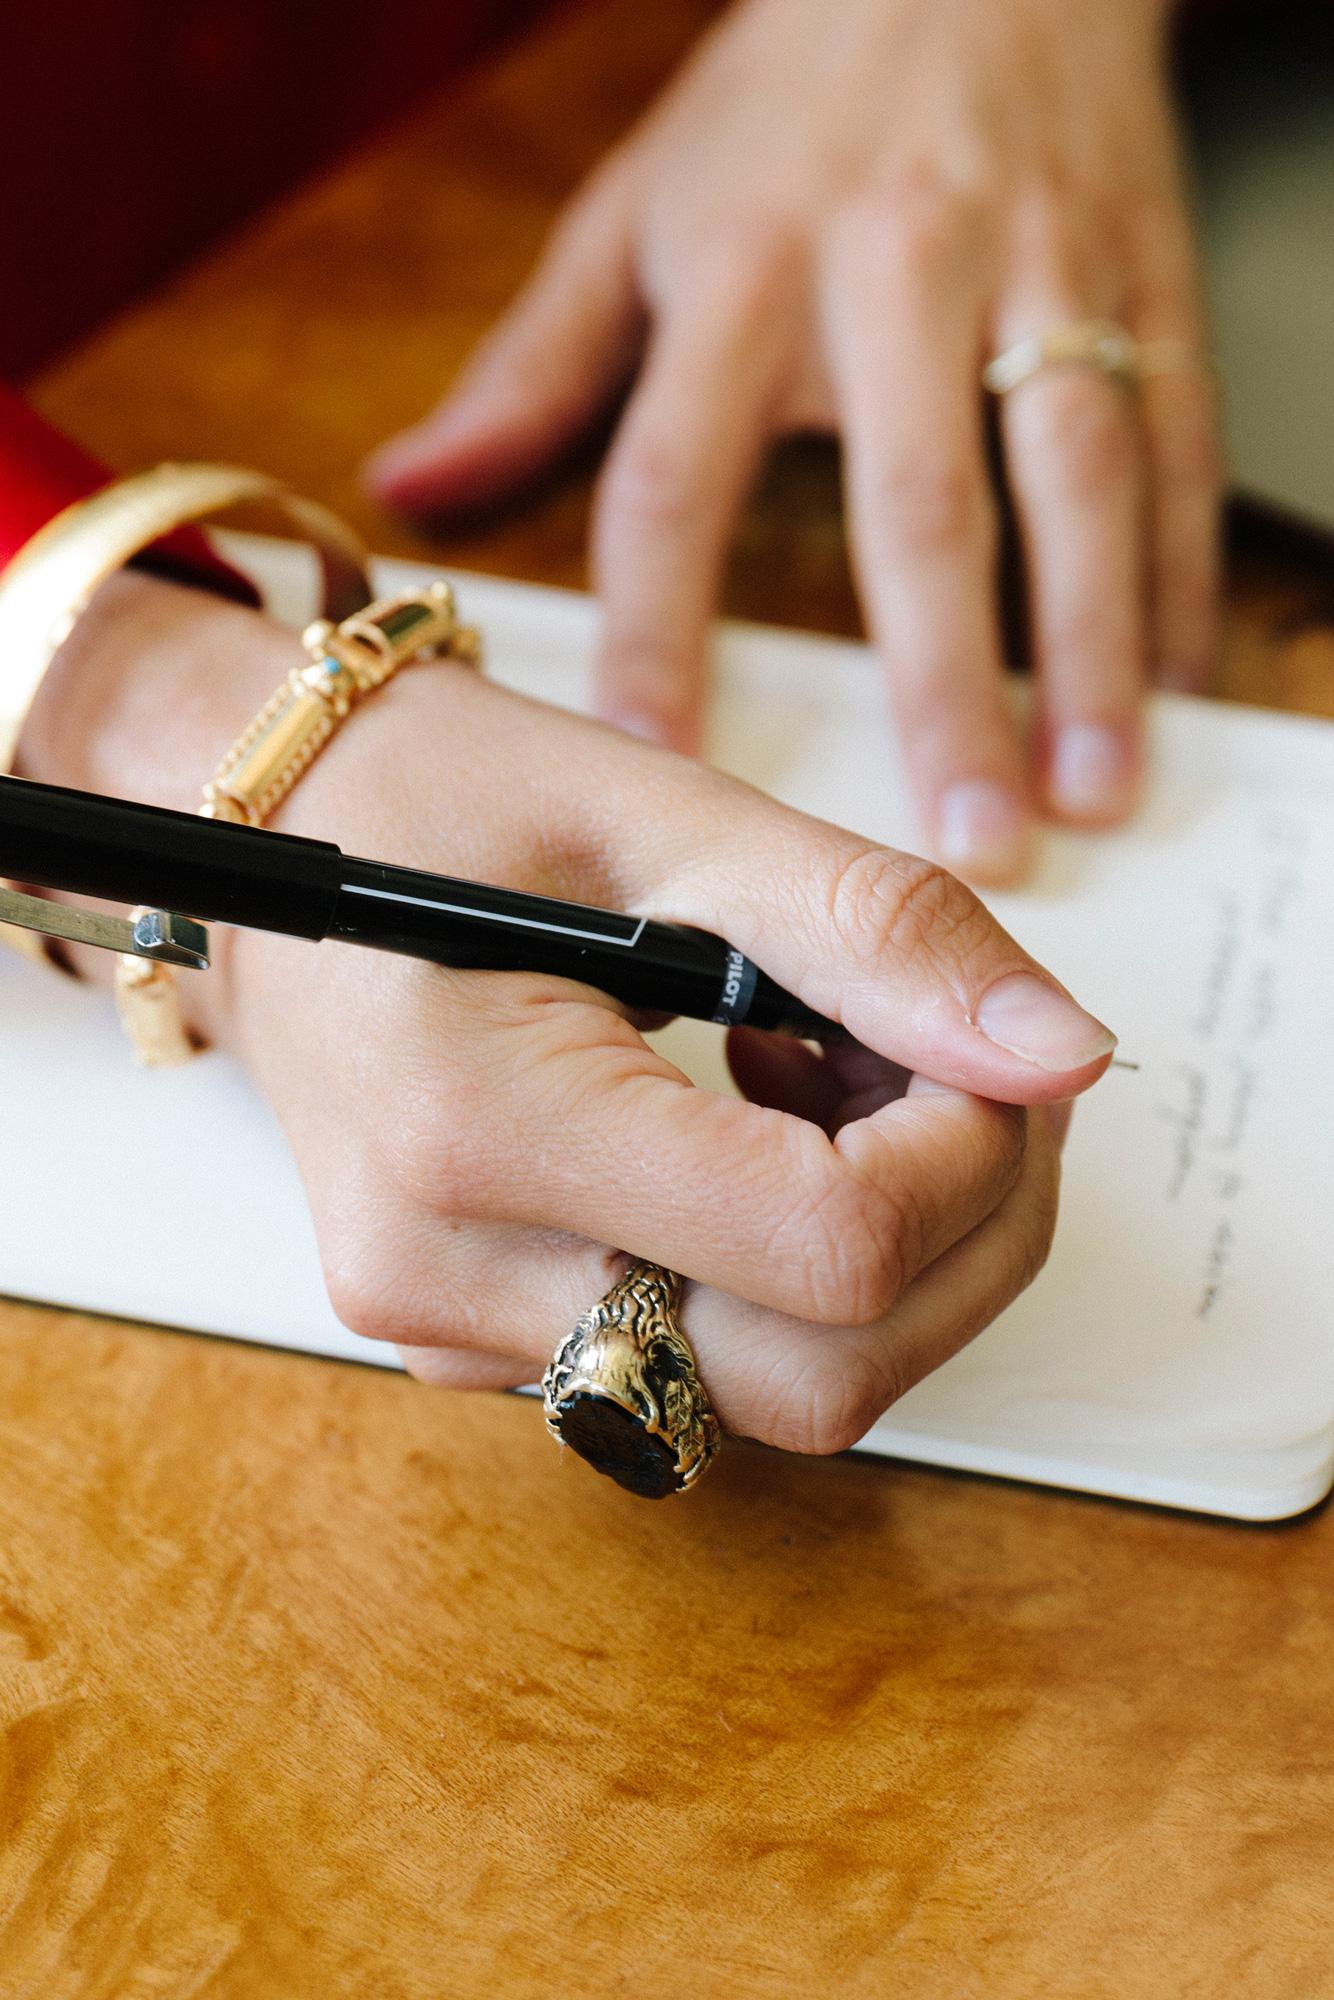 sixtysix roanne adams writing